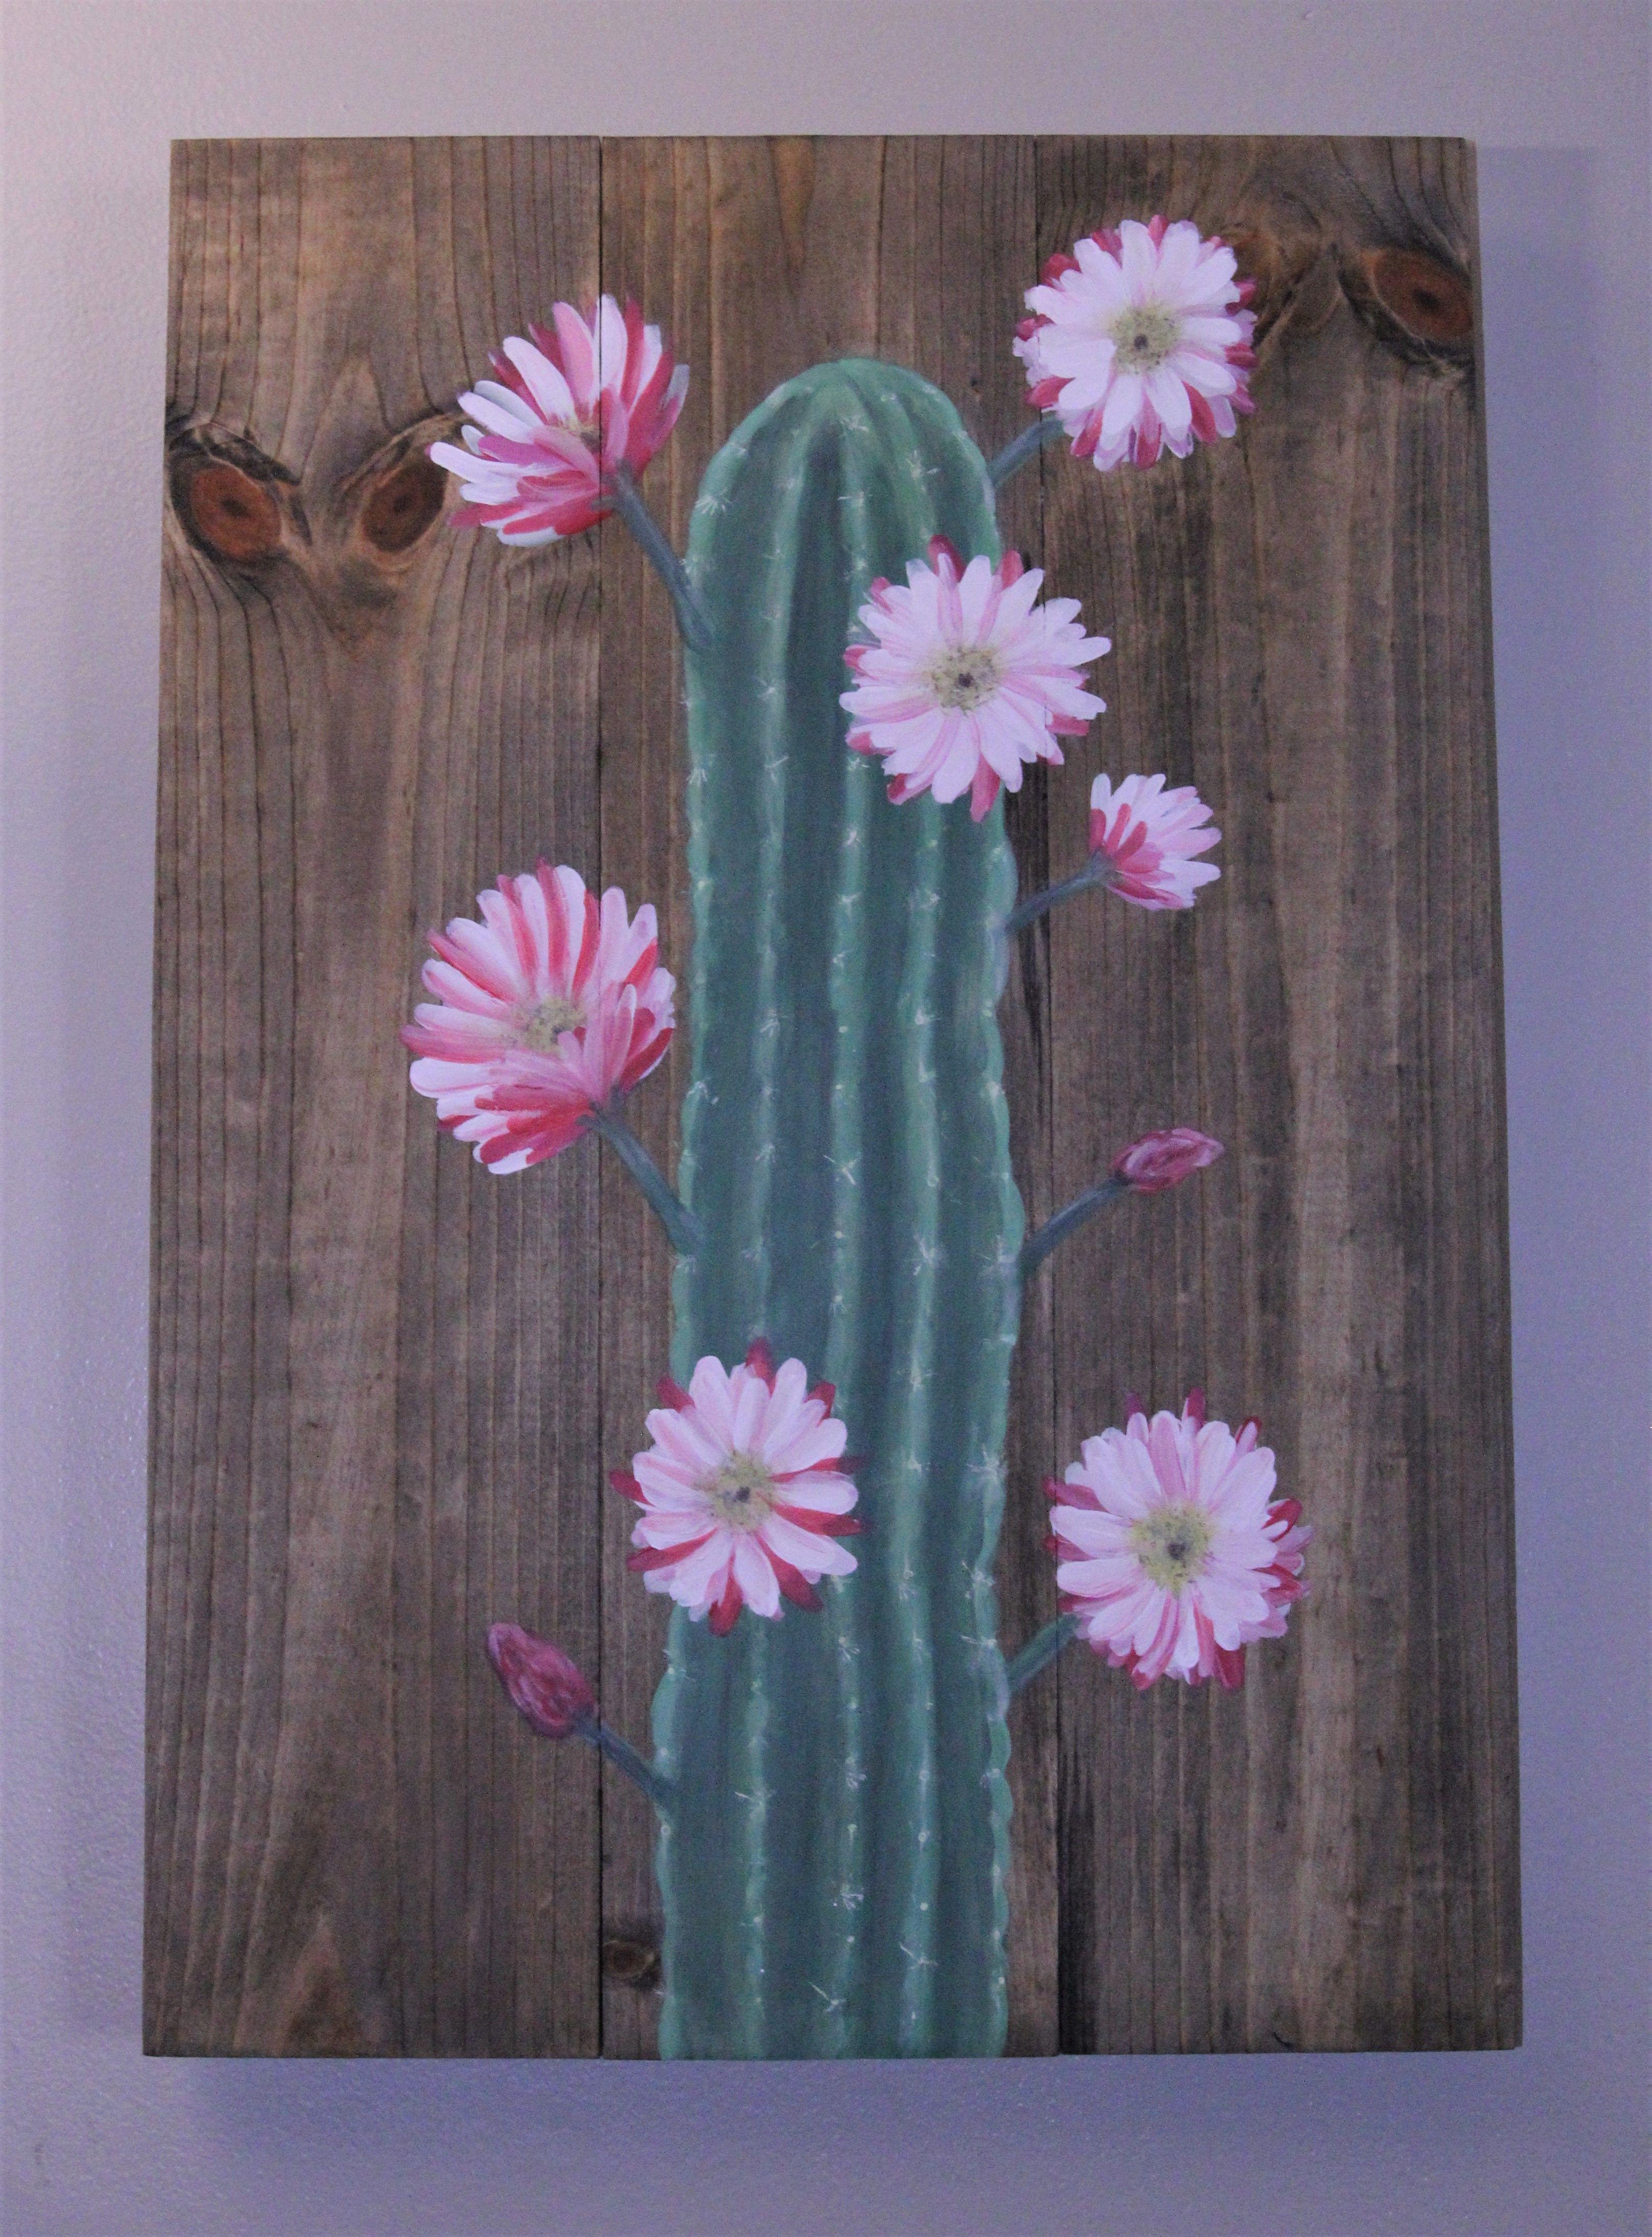 Handmade Wood Canvas Paintings by GvanaDesigns on Etsy